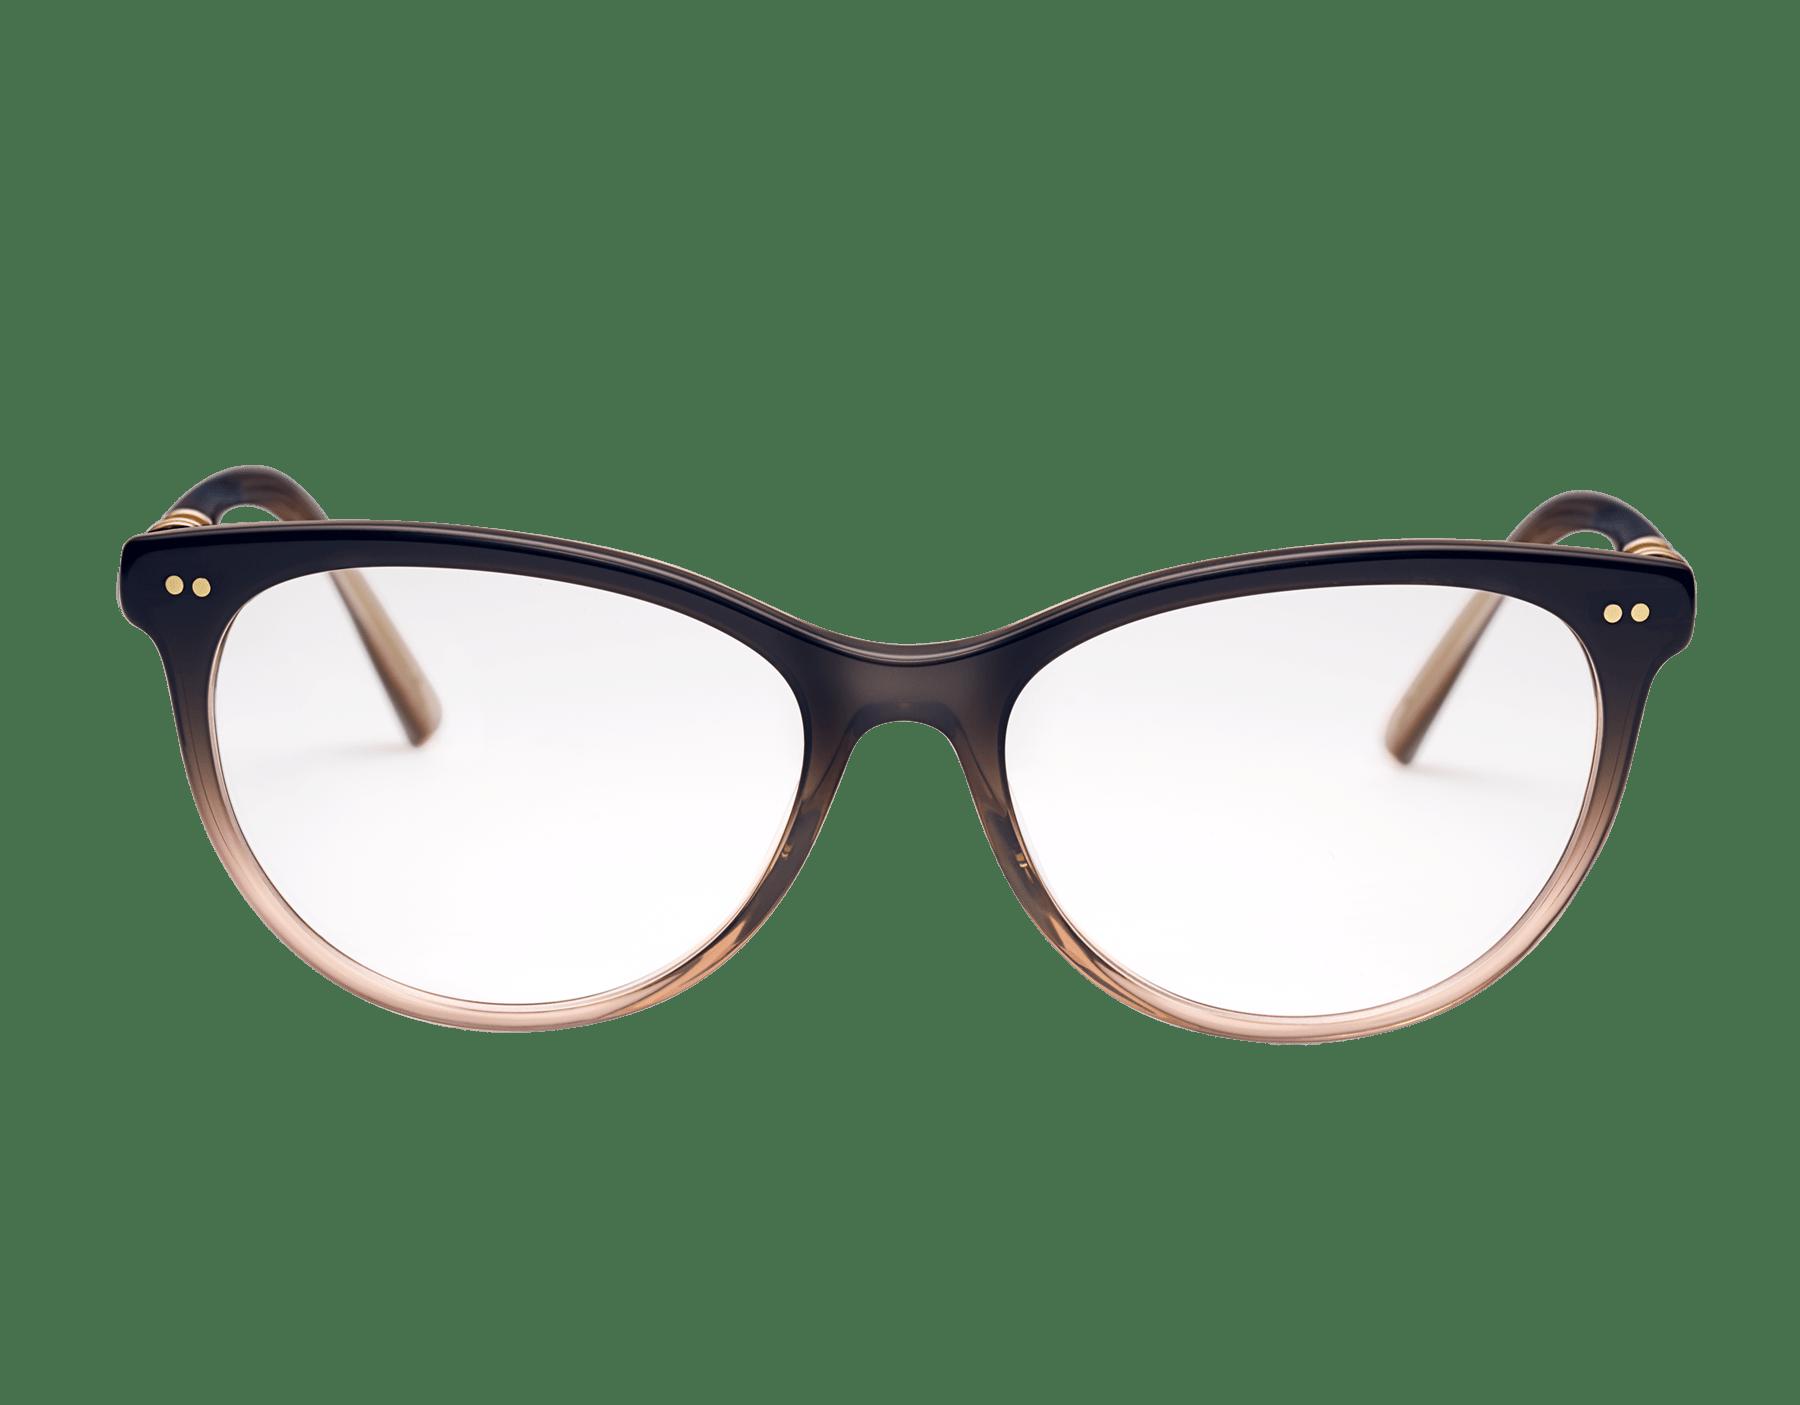 Bvlgari B.zero1 圓形貓眼醋酸纖維光學鏡架,飾以金屬元素。 903809 image 2